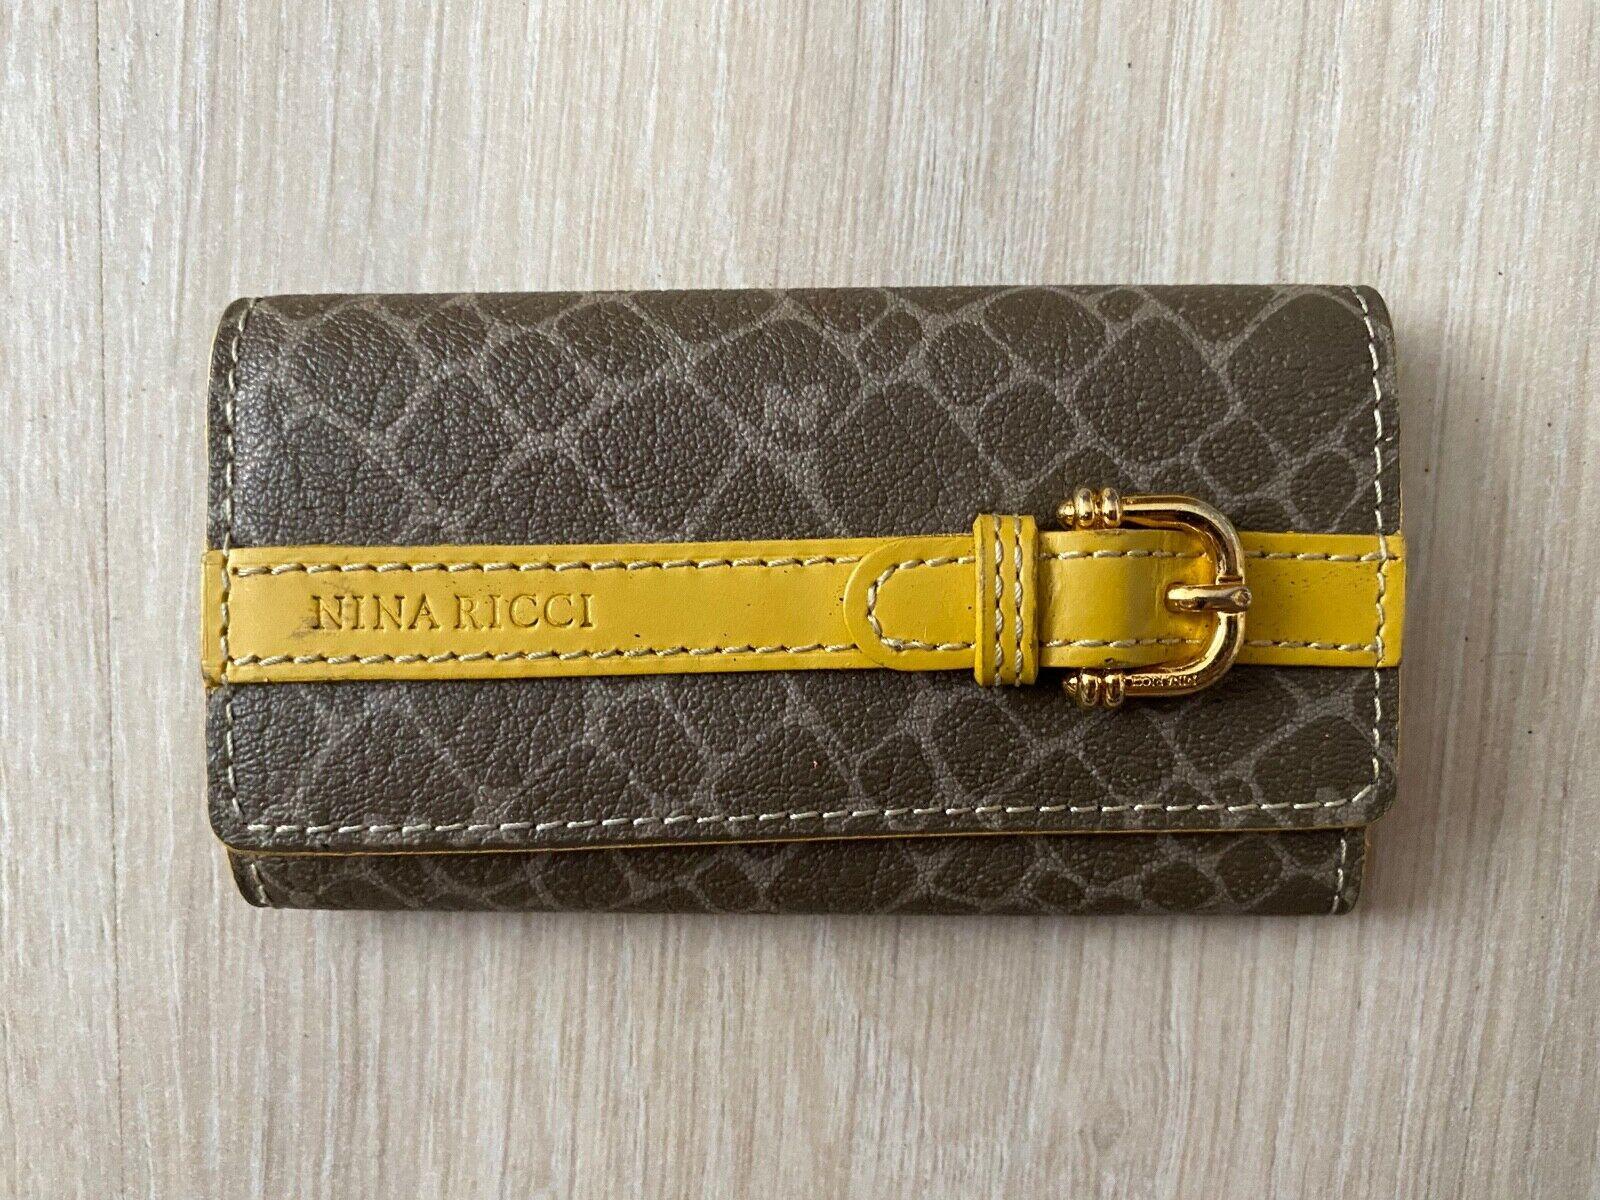 Nina Ricci 4 Key Holder Leather Vintage Snake Brown Yellow Wallet Case